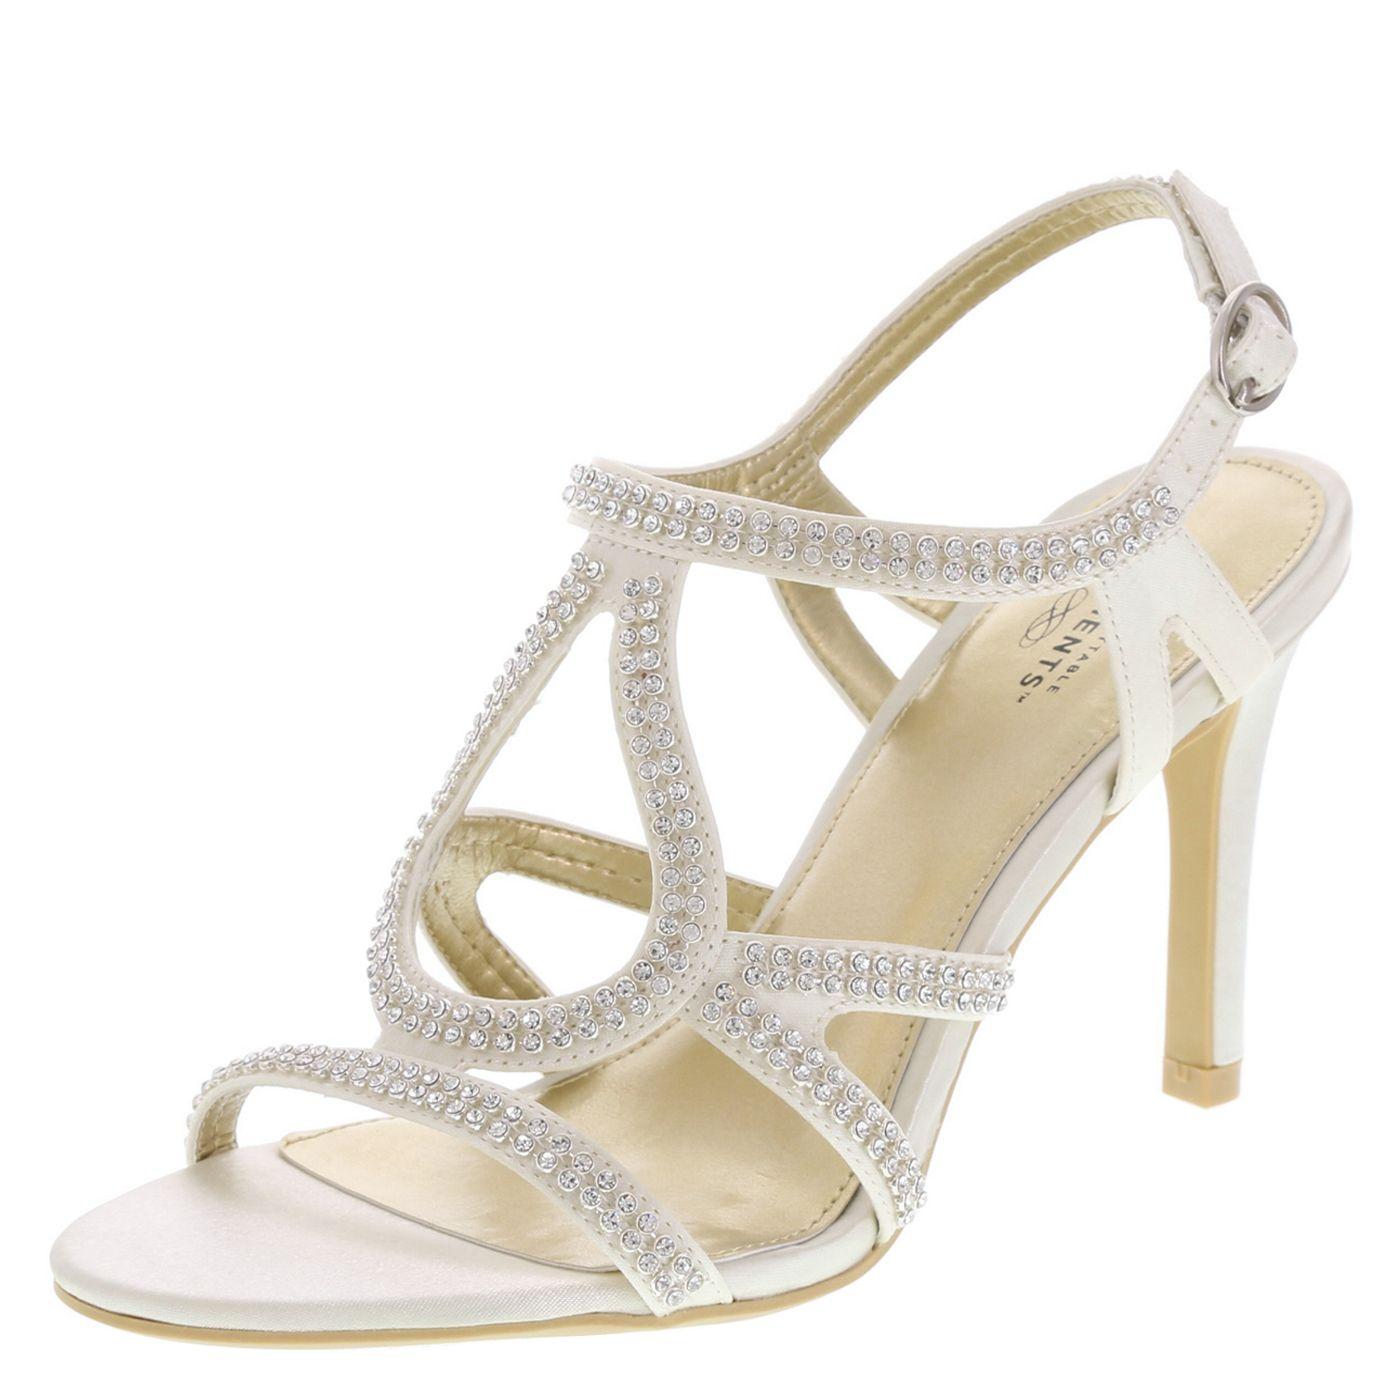 Payless Wedding Shoes: Womens Lovestruck Stone Sandal - Womens